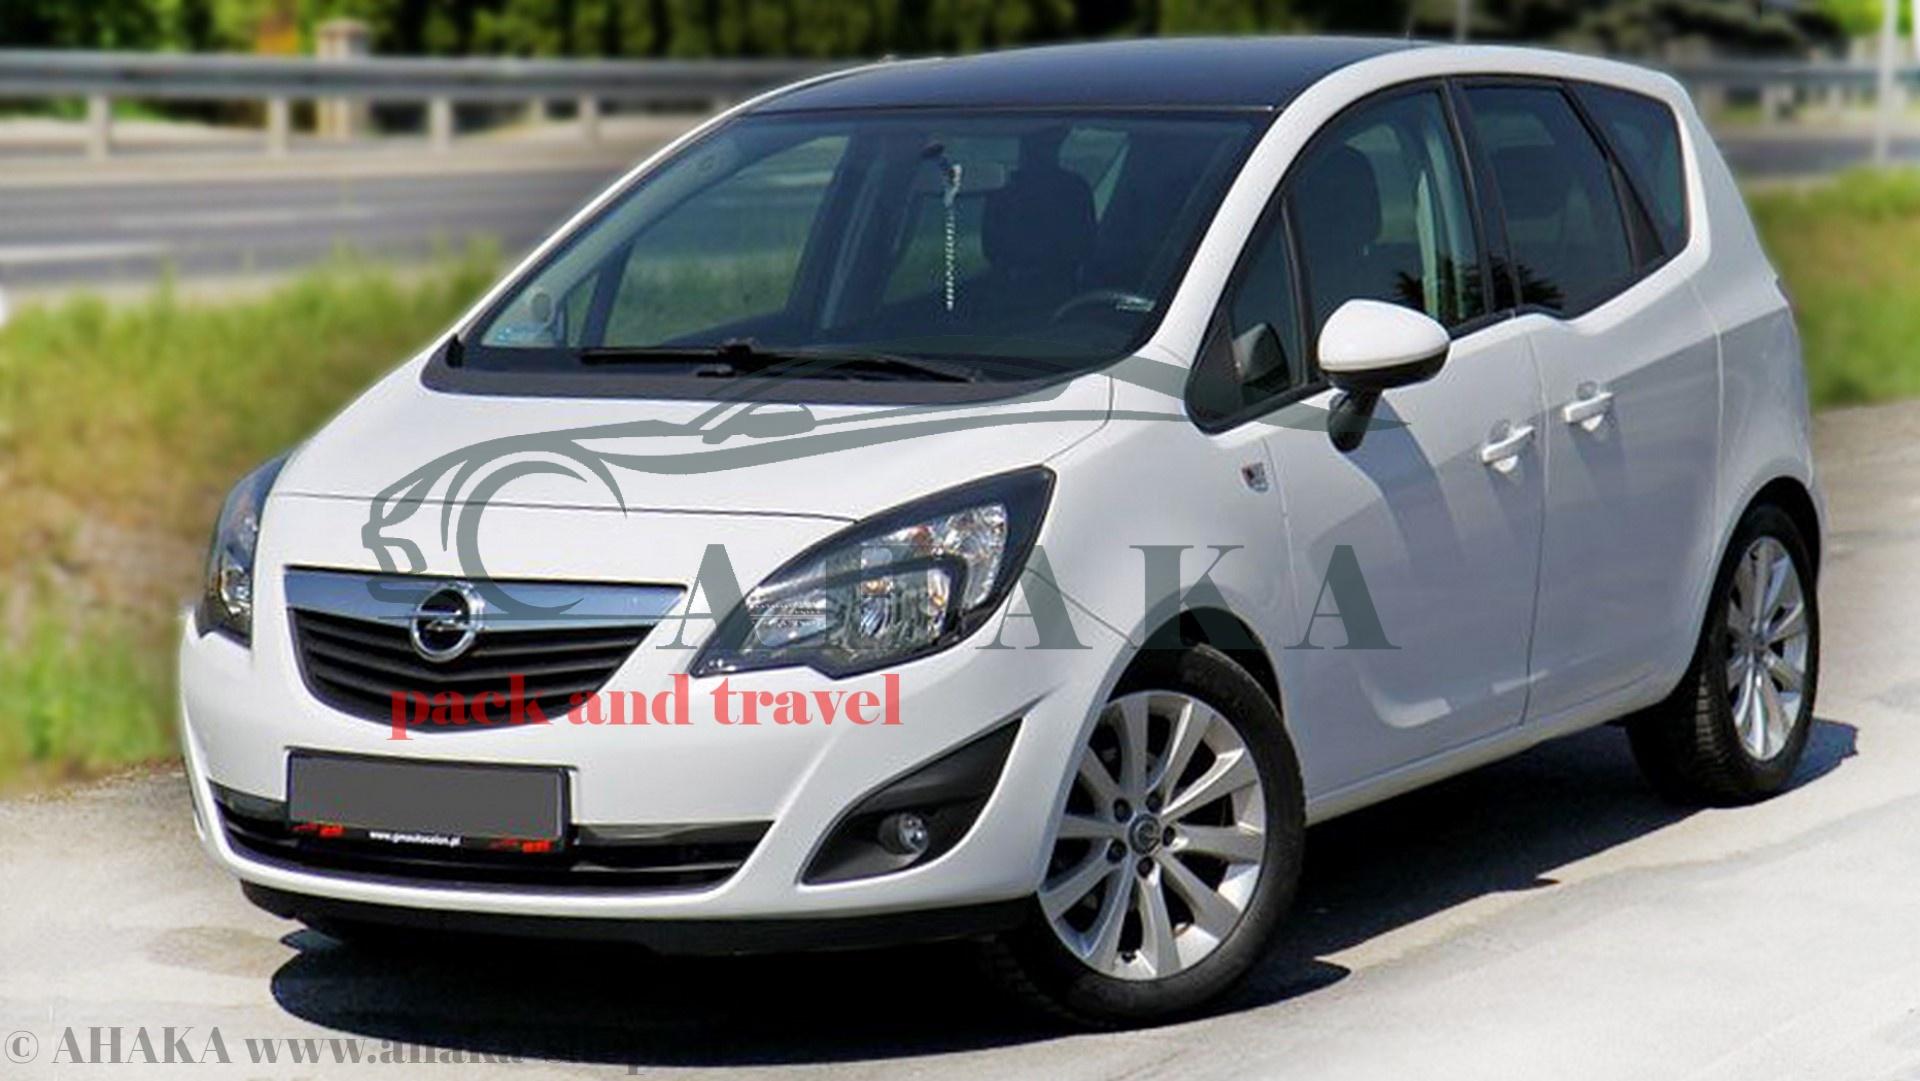 13polig E-Satz AHK Opel Meriva A 2003-2010 AUTO HAK Anhängerkupplung abnehmbar